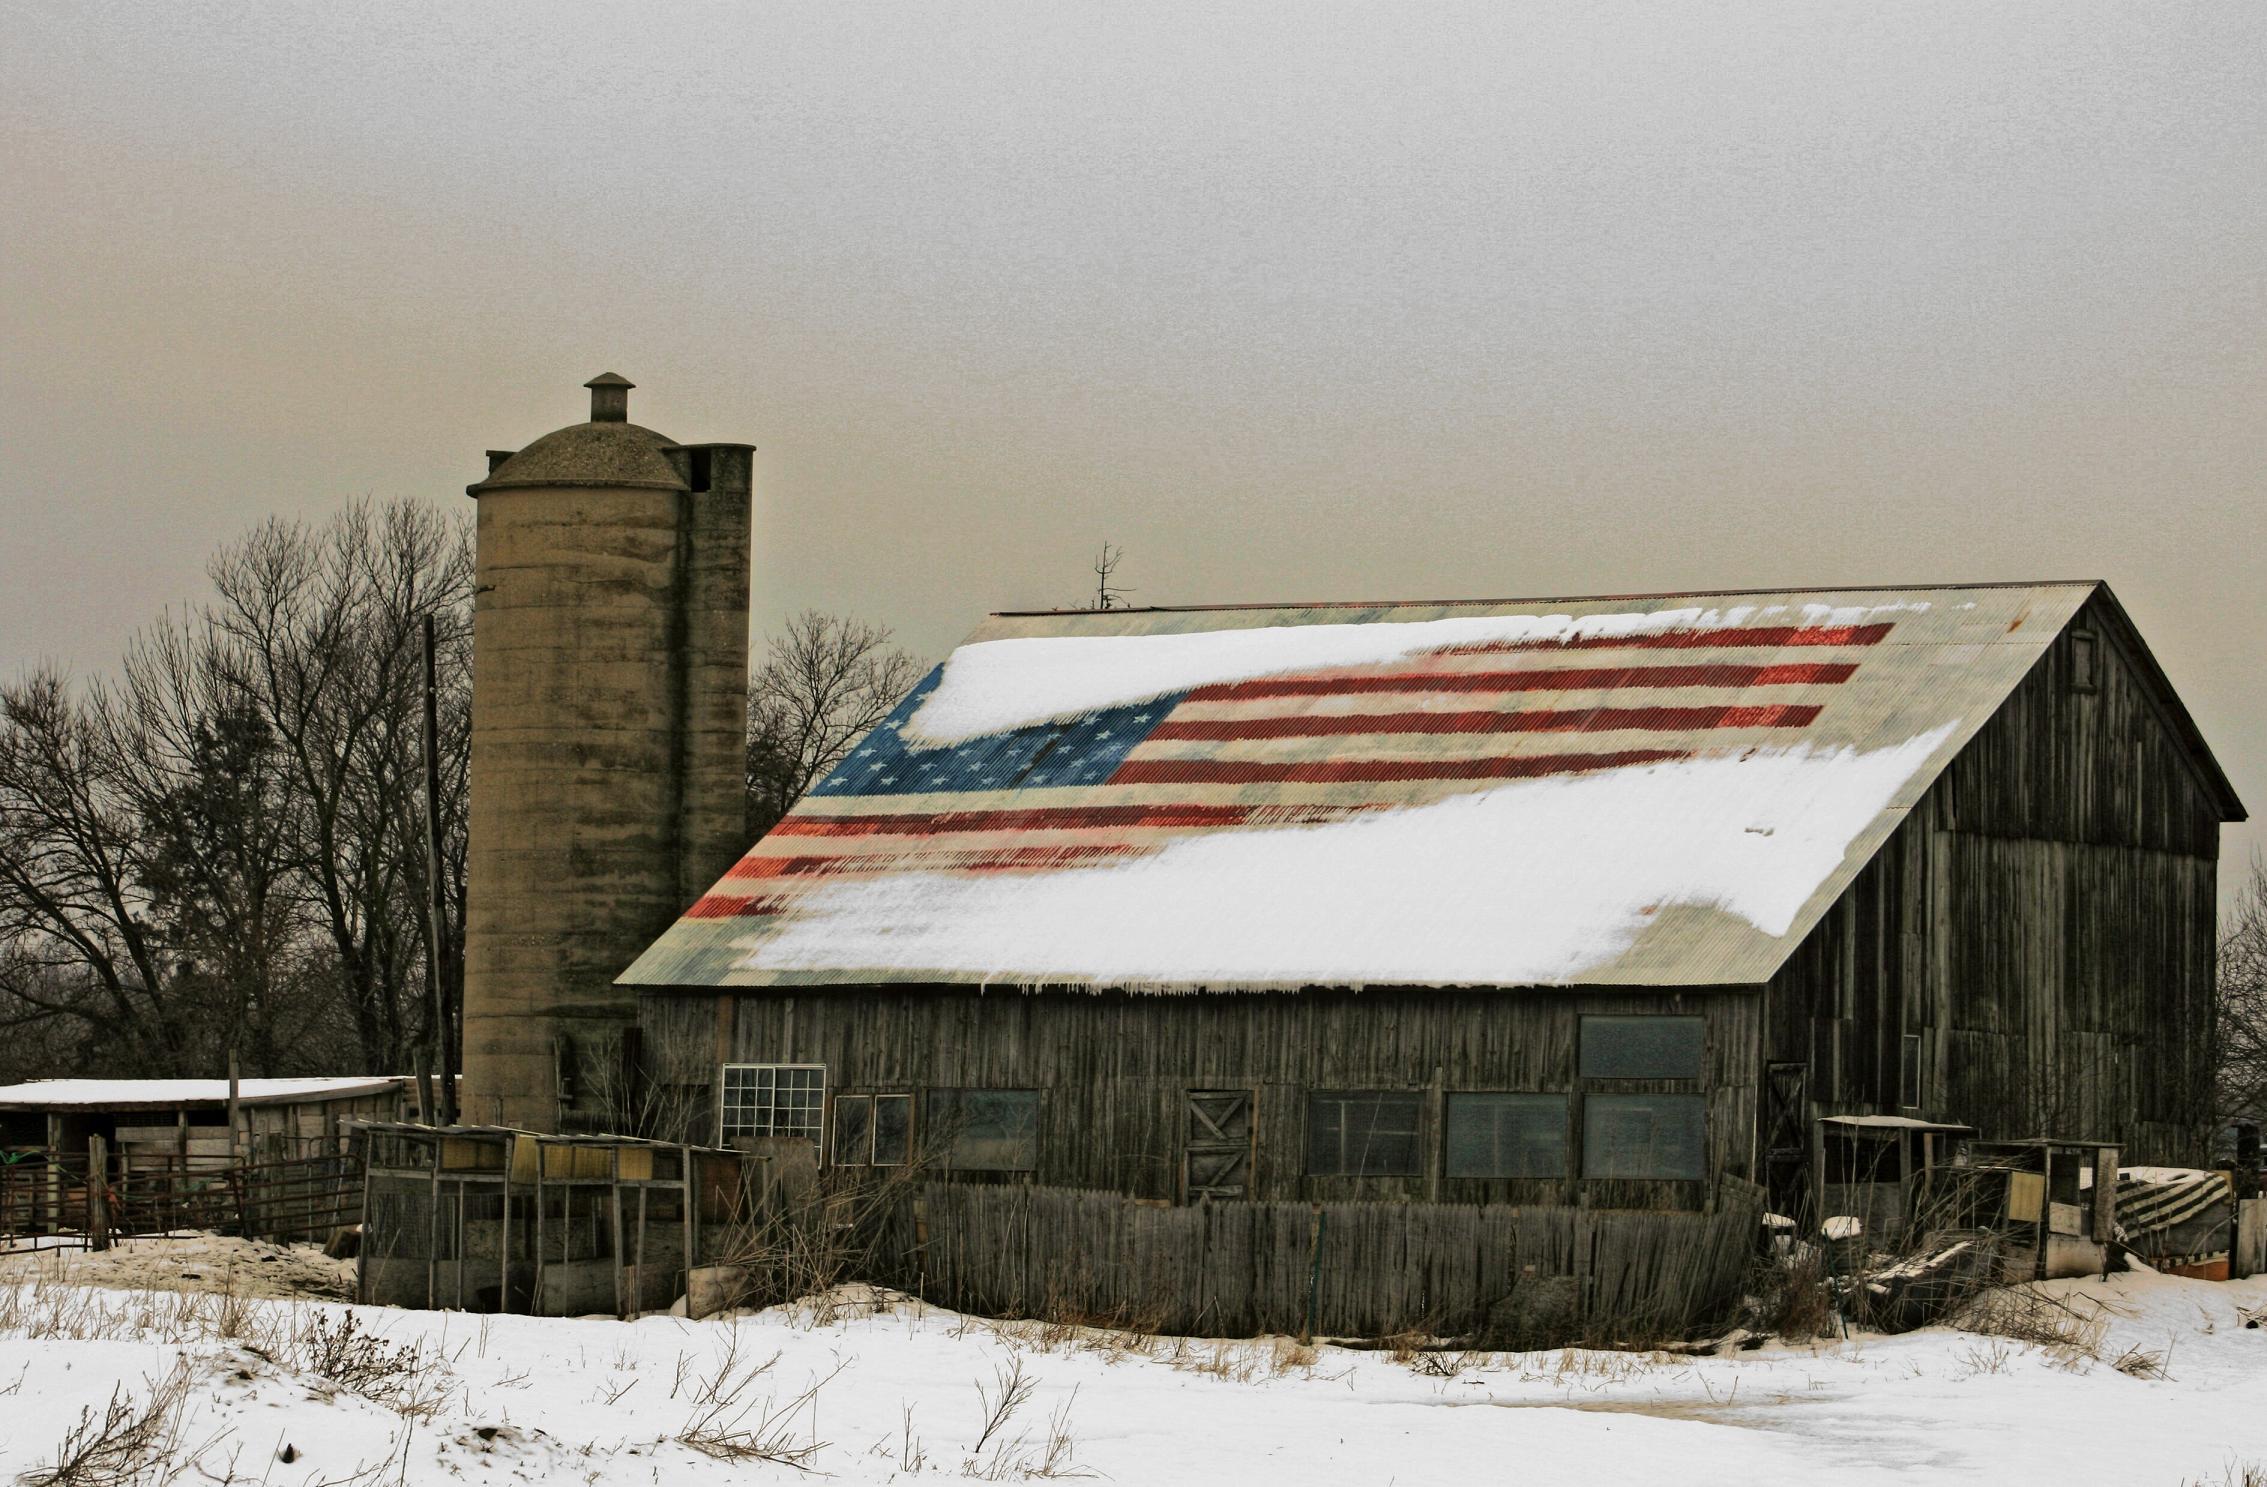 Snow Winter House Barn Rustic Rural Farming Weather Season Farms Americanflag Barns Shape Brighton Newagecrapphotography Wisconsinbarn